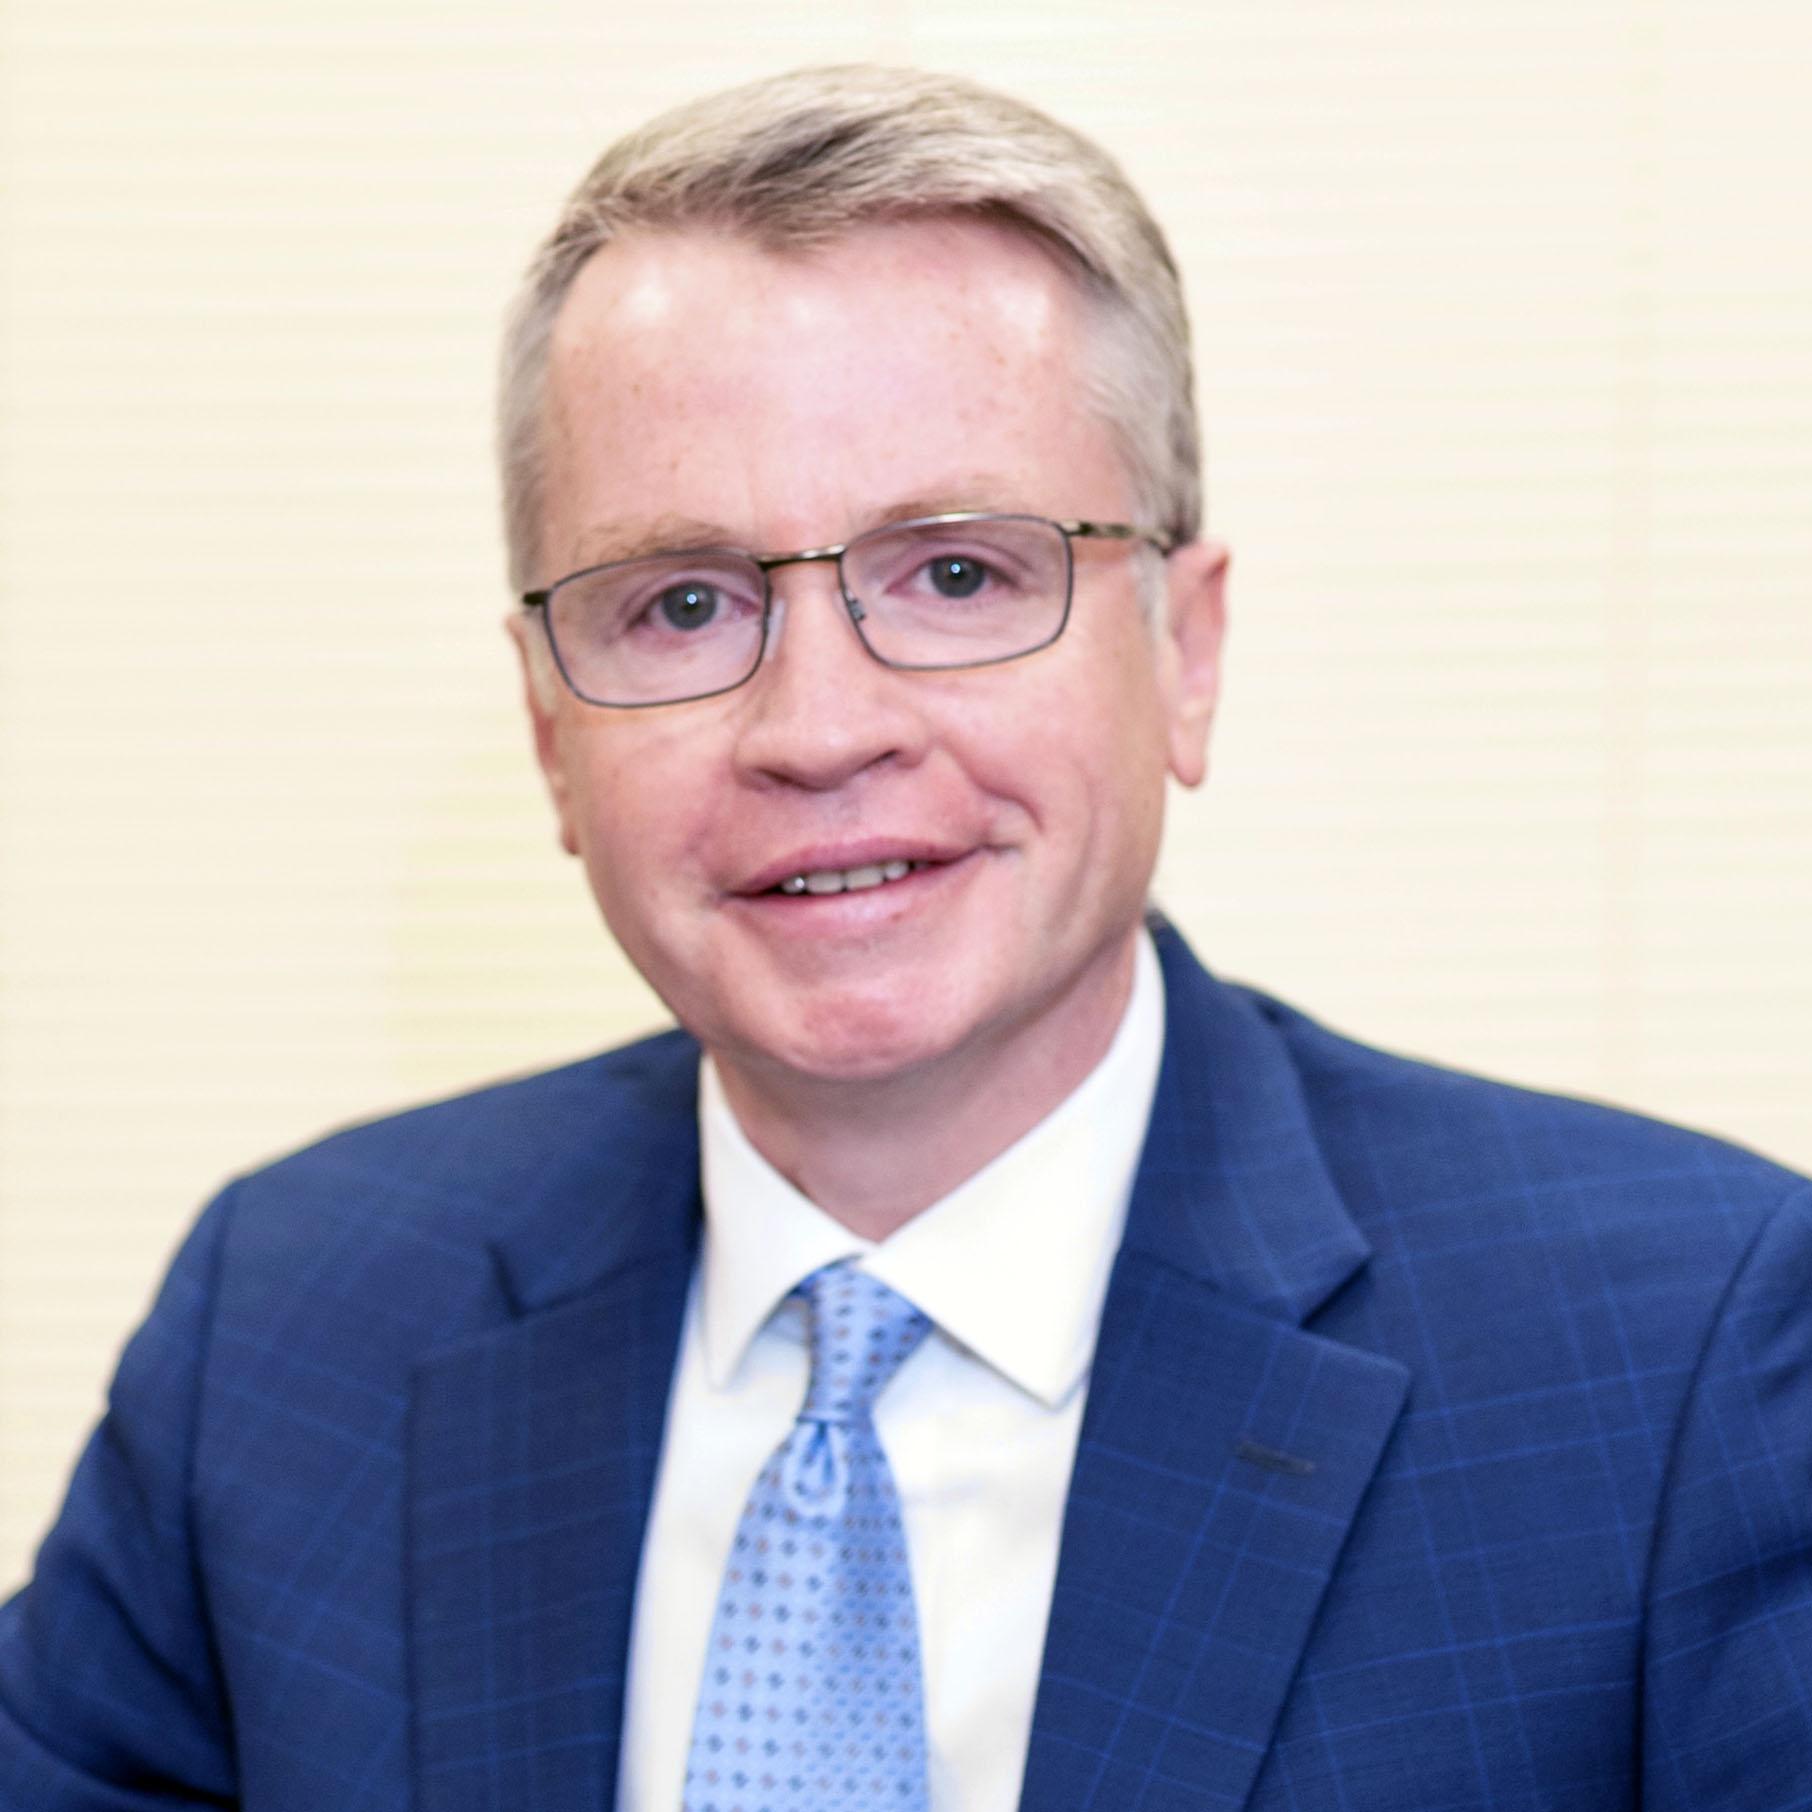 Glenelg Country School Announces Matt Walsh as Its Next Head of School